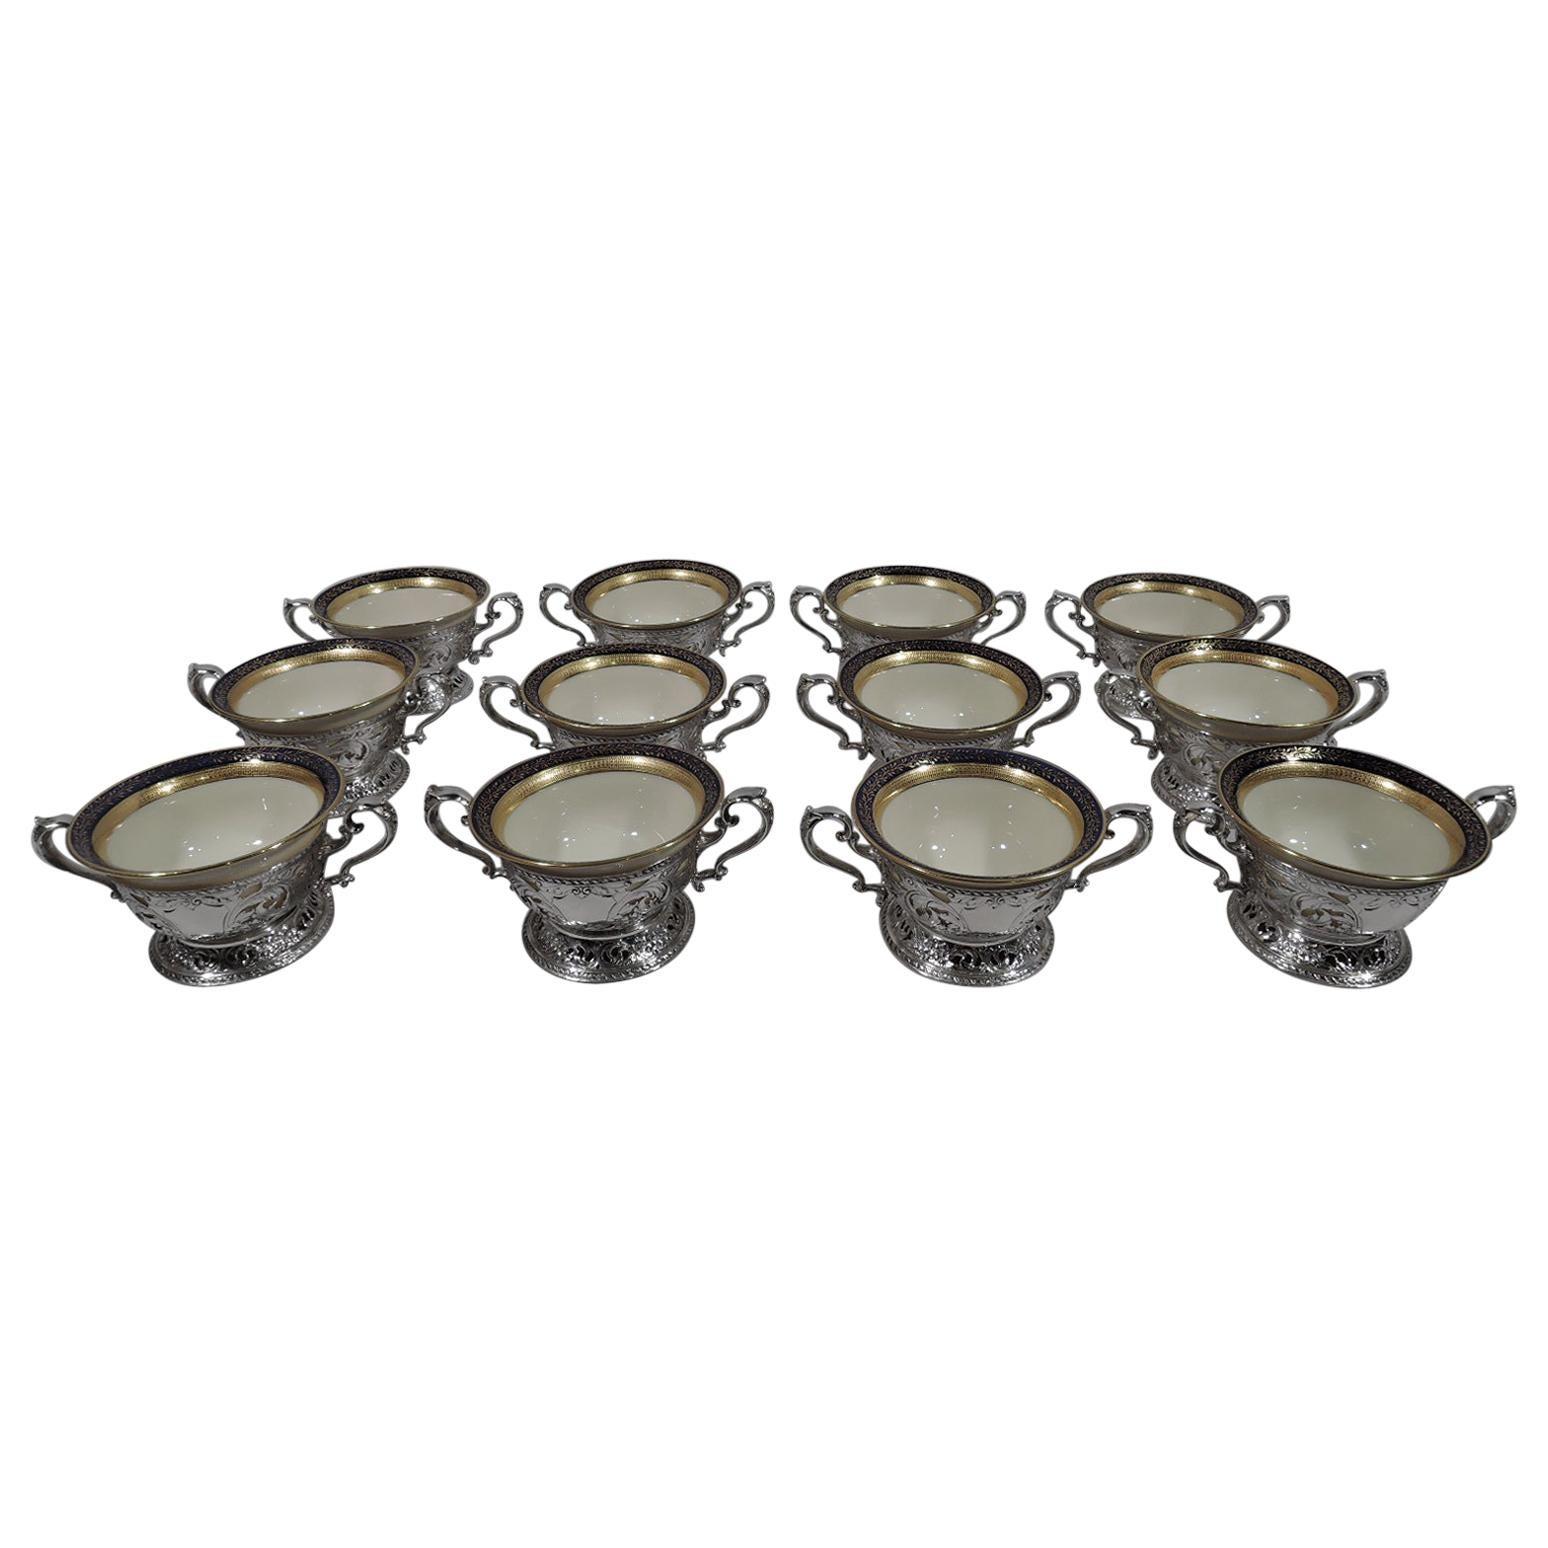 Set of 12 Lenox Bouillon Bowls in Gorham Sterling Silver Holders